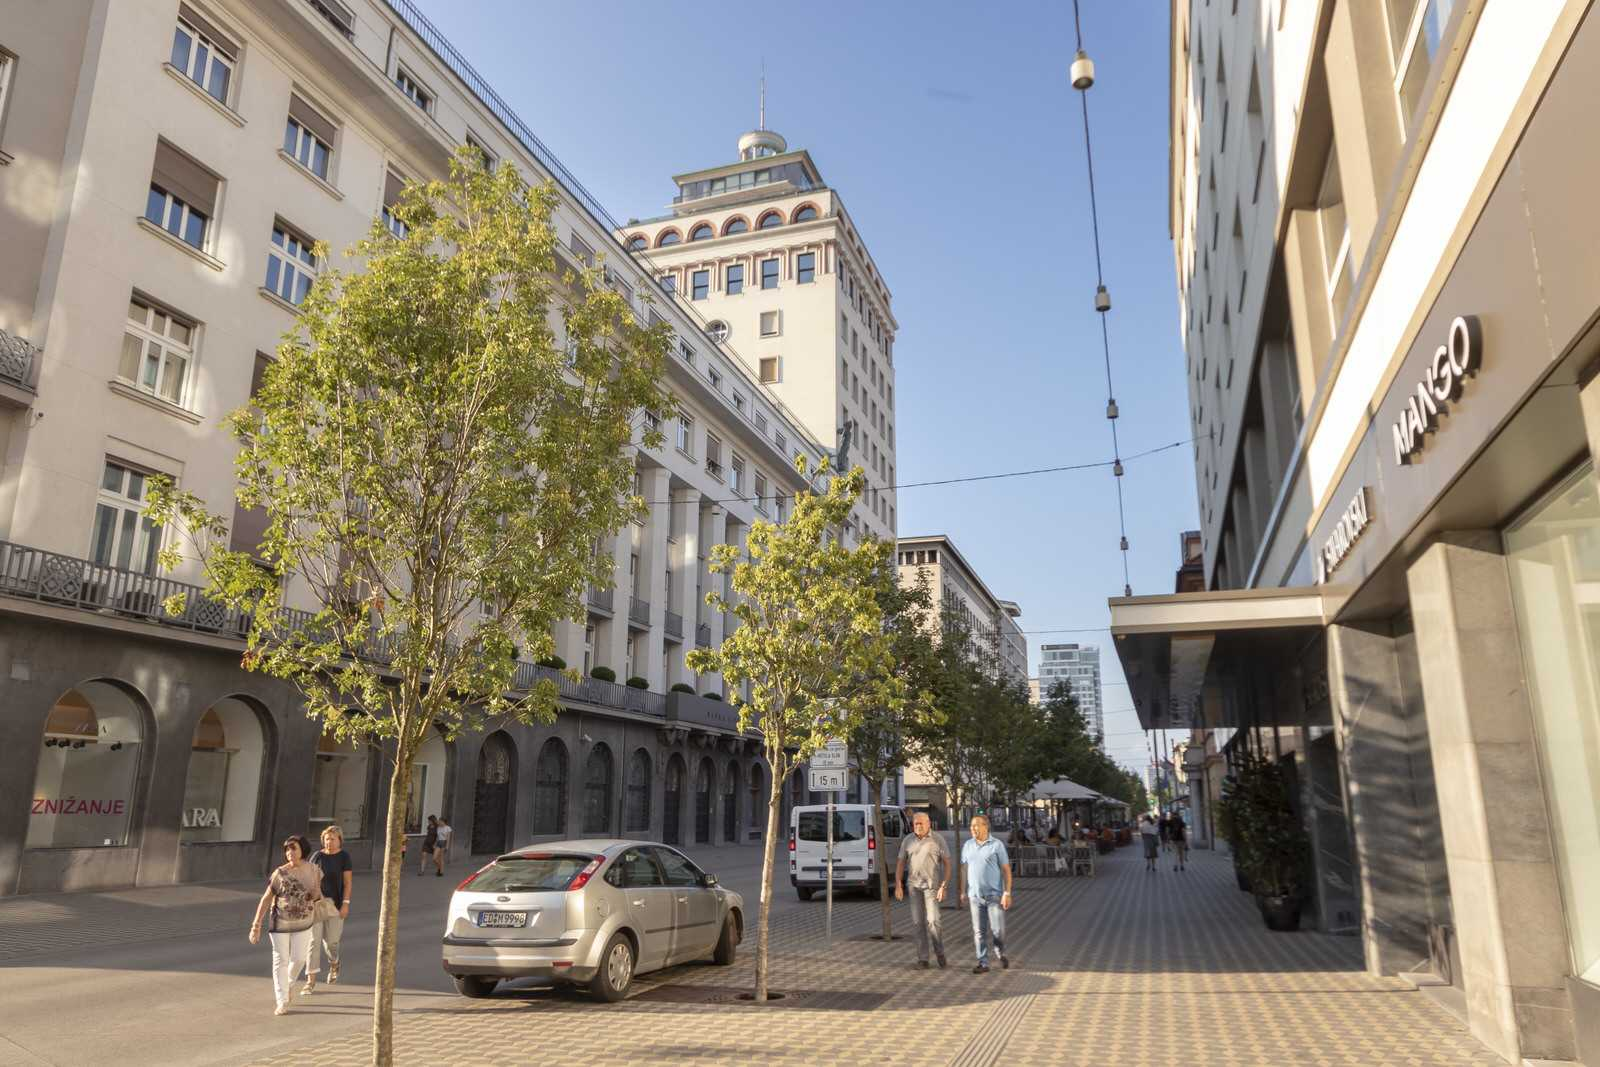 Slovenska street near Trdinova apartment as a part of the old town pedestrian zone